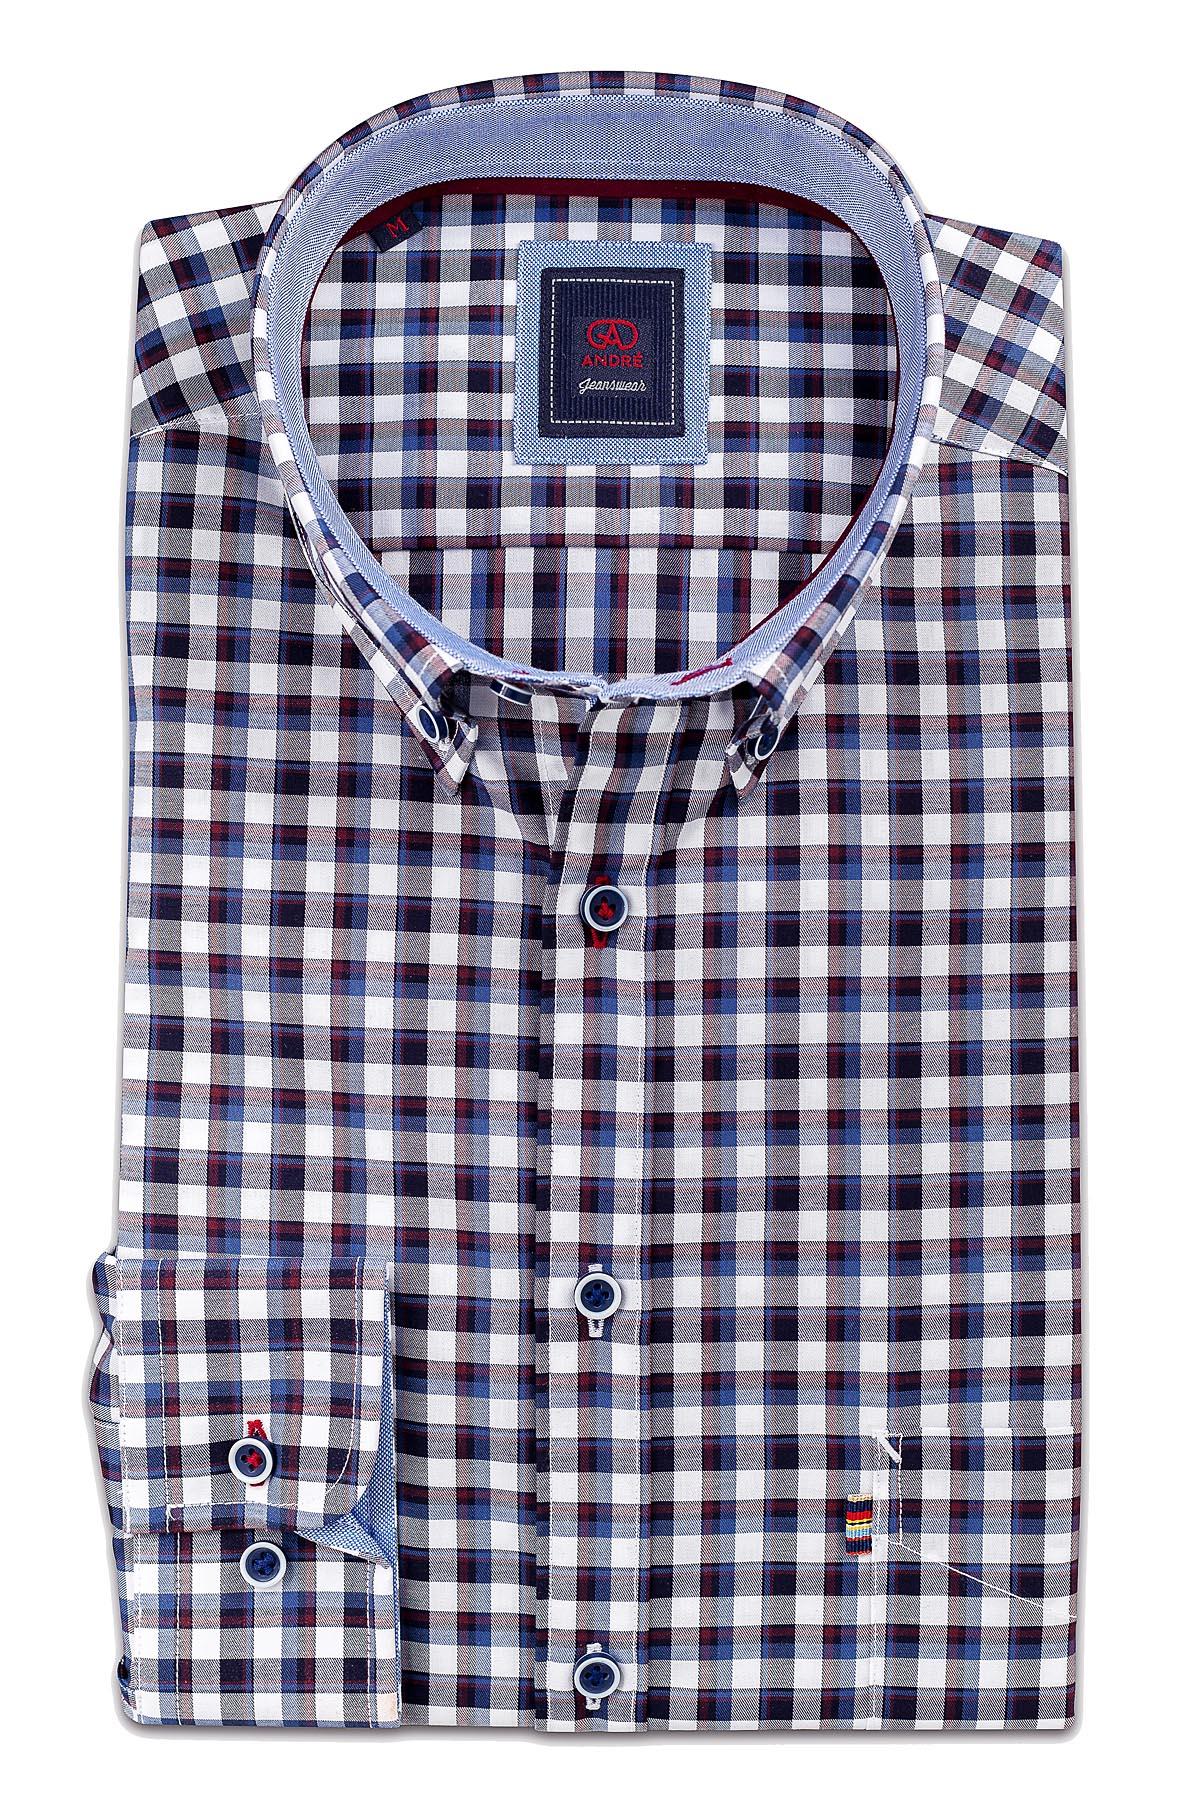 Jeanswear-Moy-Burgundy.jpg